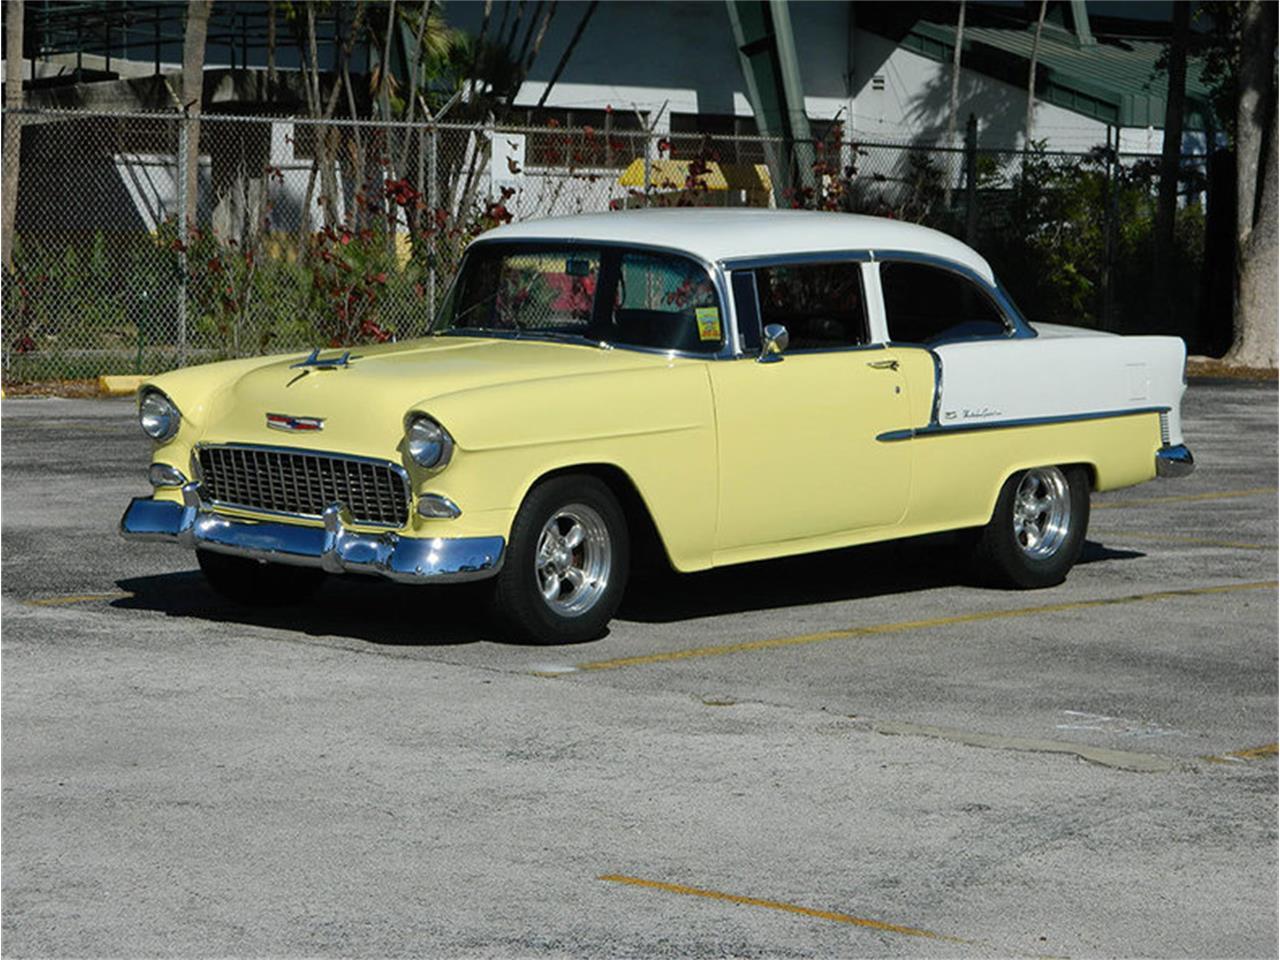 1955 Chevrolet Bel Air 2 Door Post in Fort Lauderdale, Florida